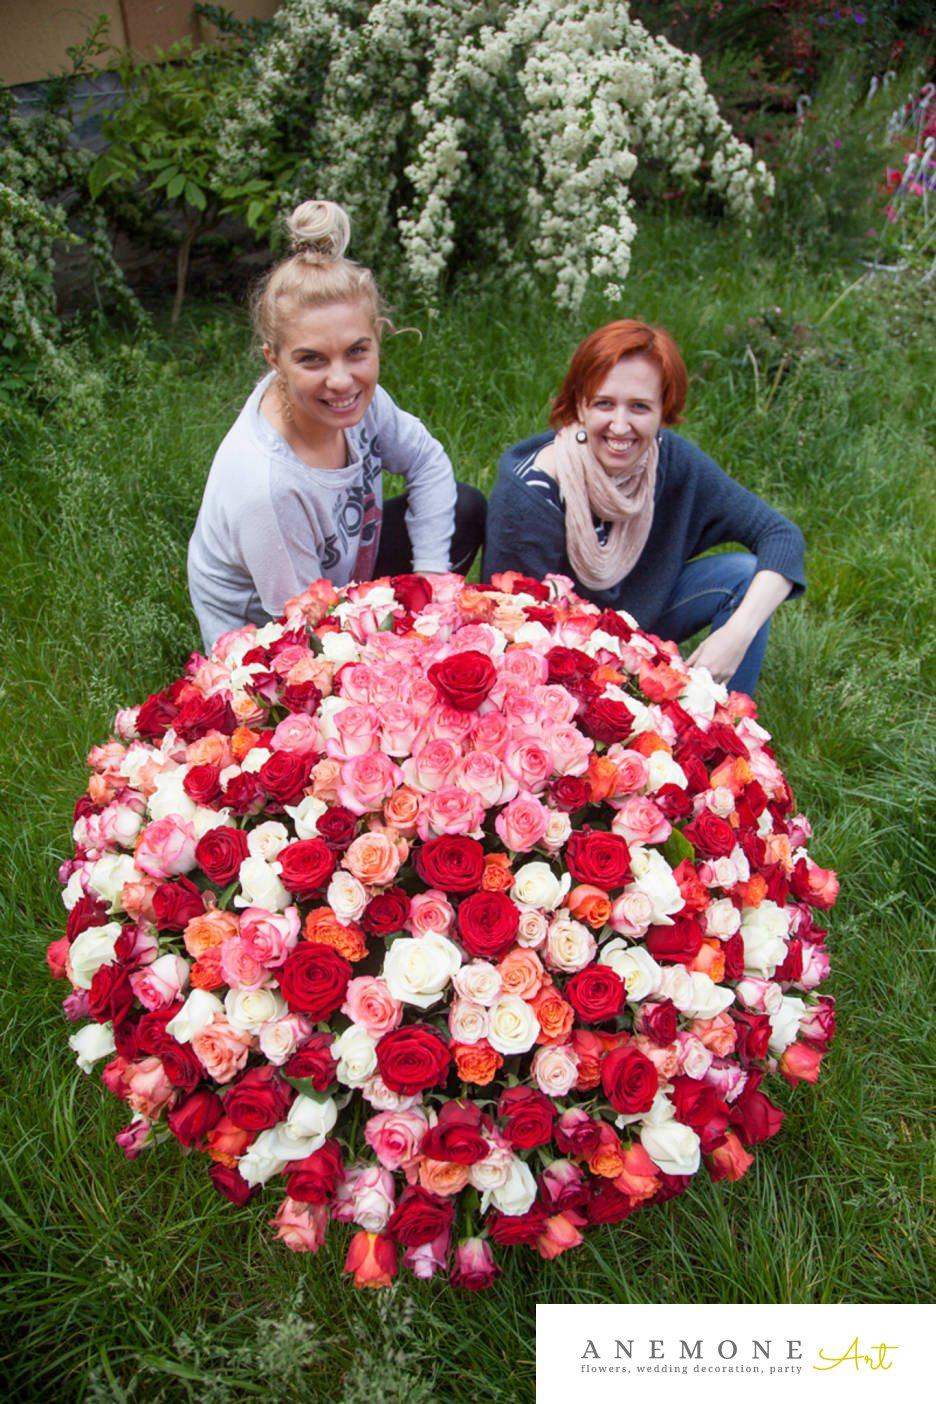 Poza, foto cu Flori de nunta alb, cos flori, rosu, roz, trandafiri in Arad, Timisoara, Oradea (wedding flowers, bouquets) nunta Arad, Timisoara, Oradea